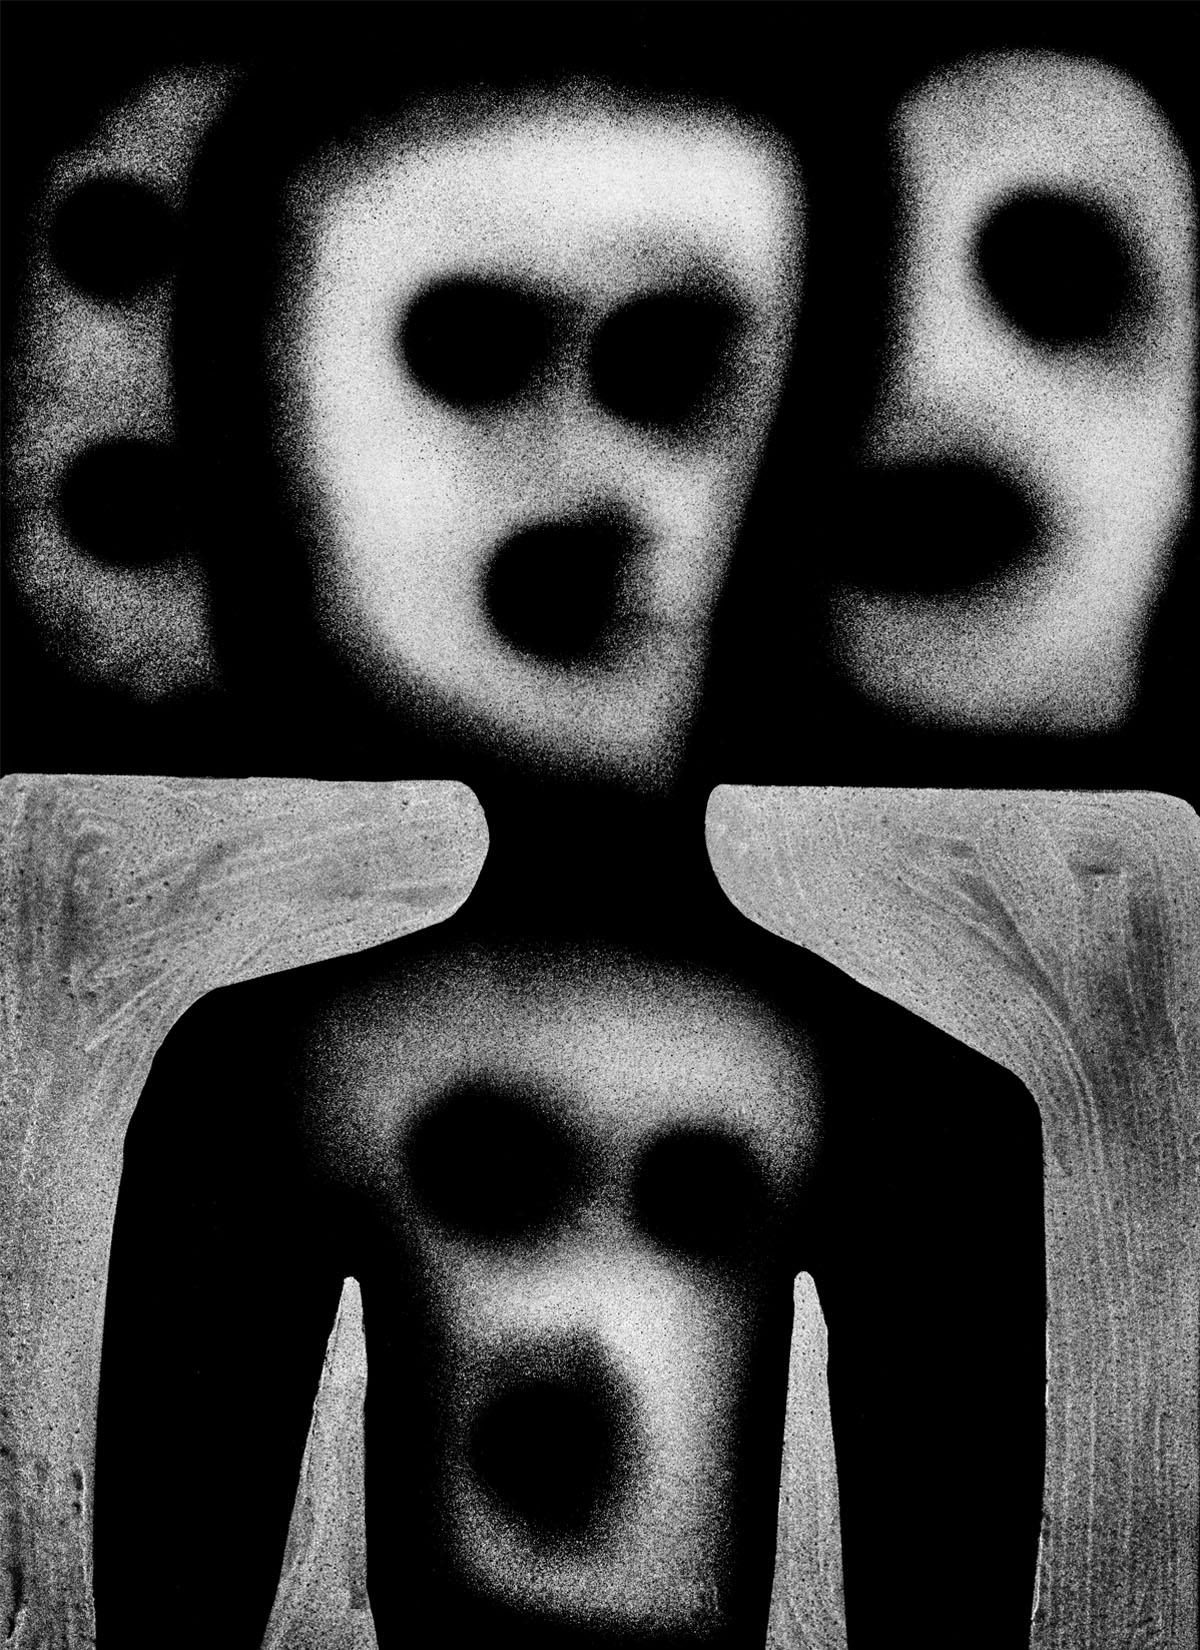 theatre-apparition-roger-ballen-09